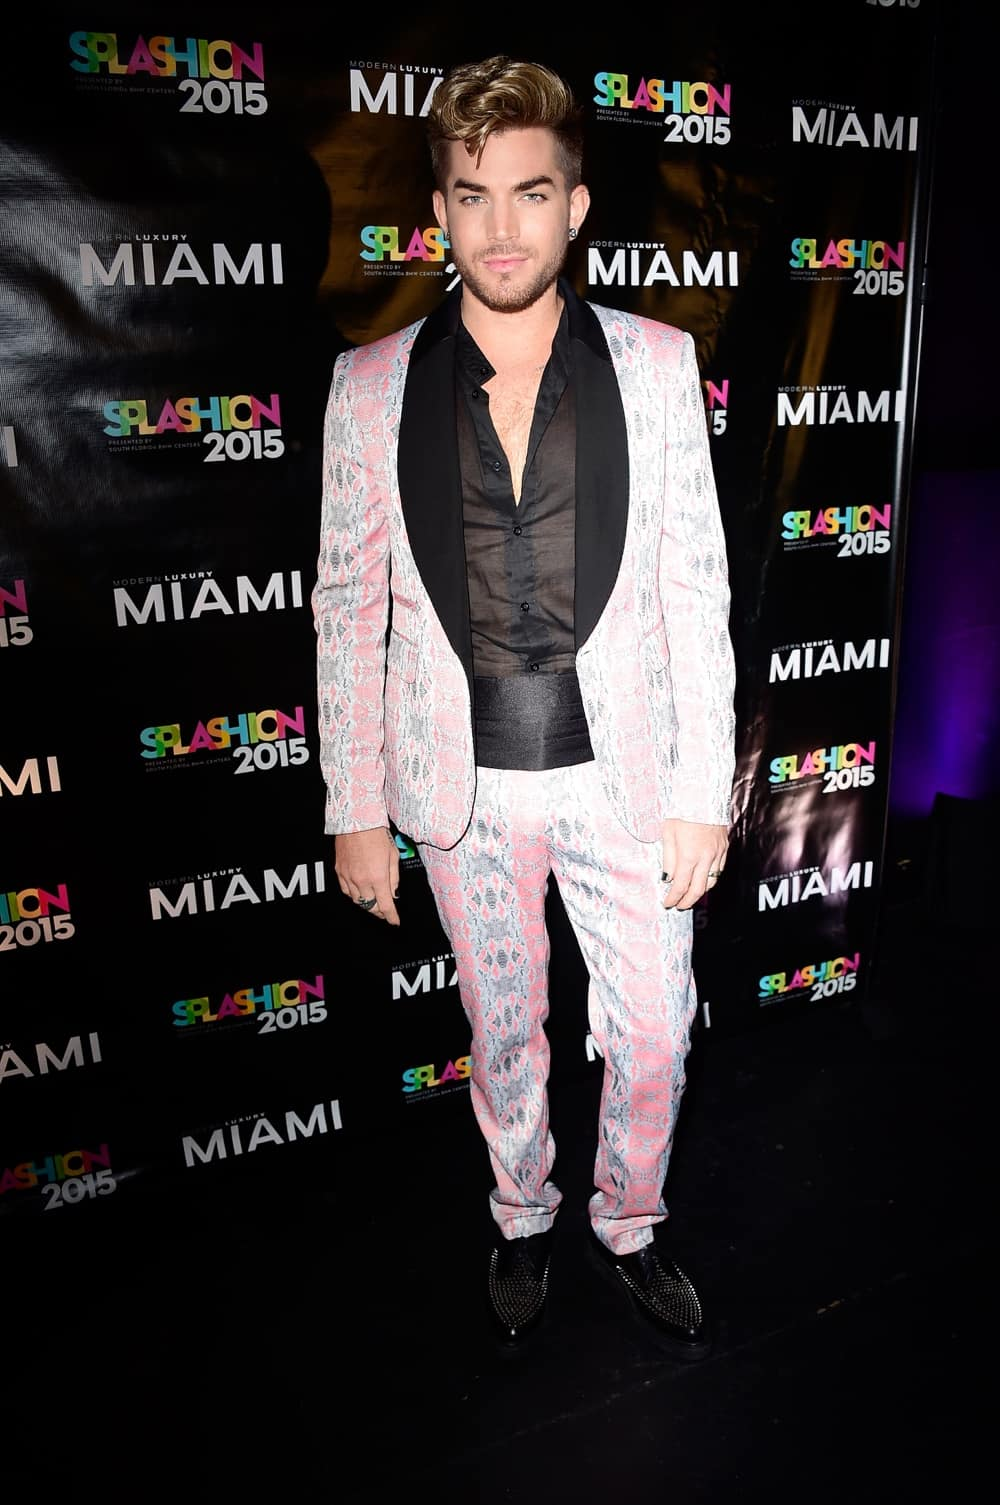 Adam Lambert at Miami Magazine's Splashion At Fillmore Miami Beach